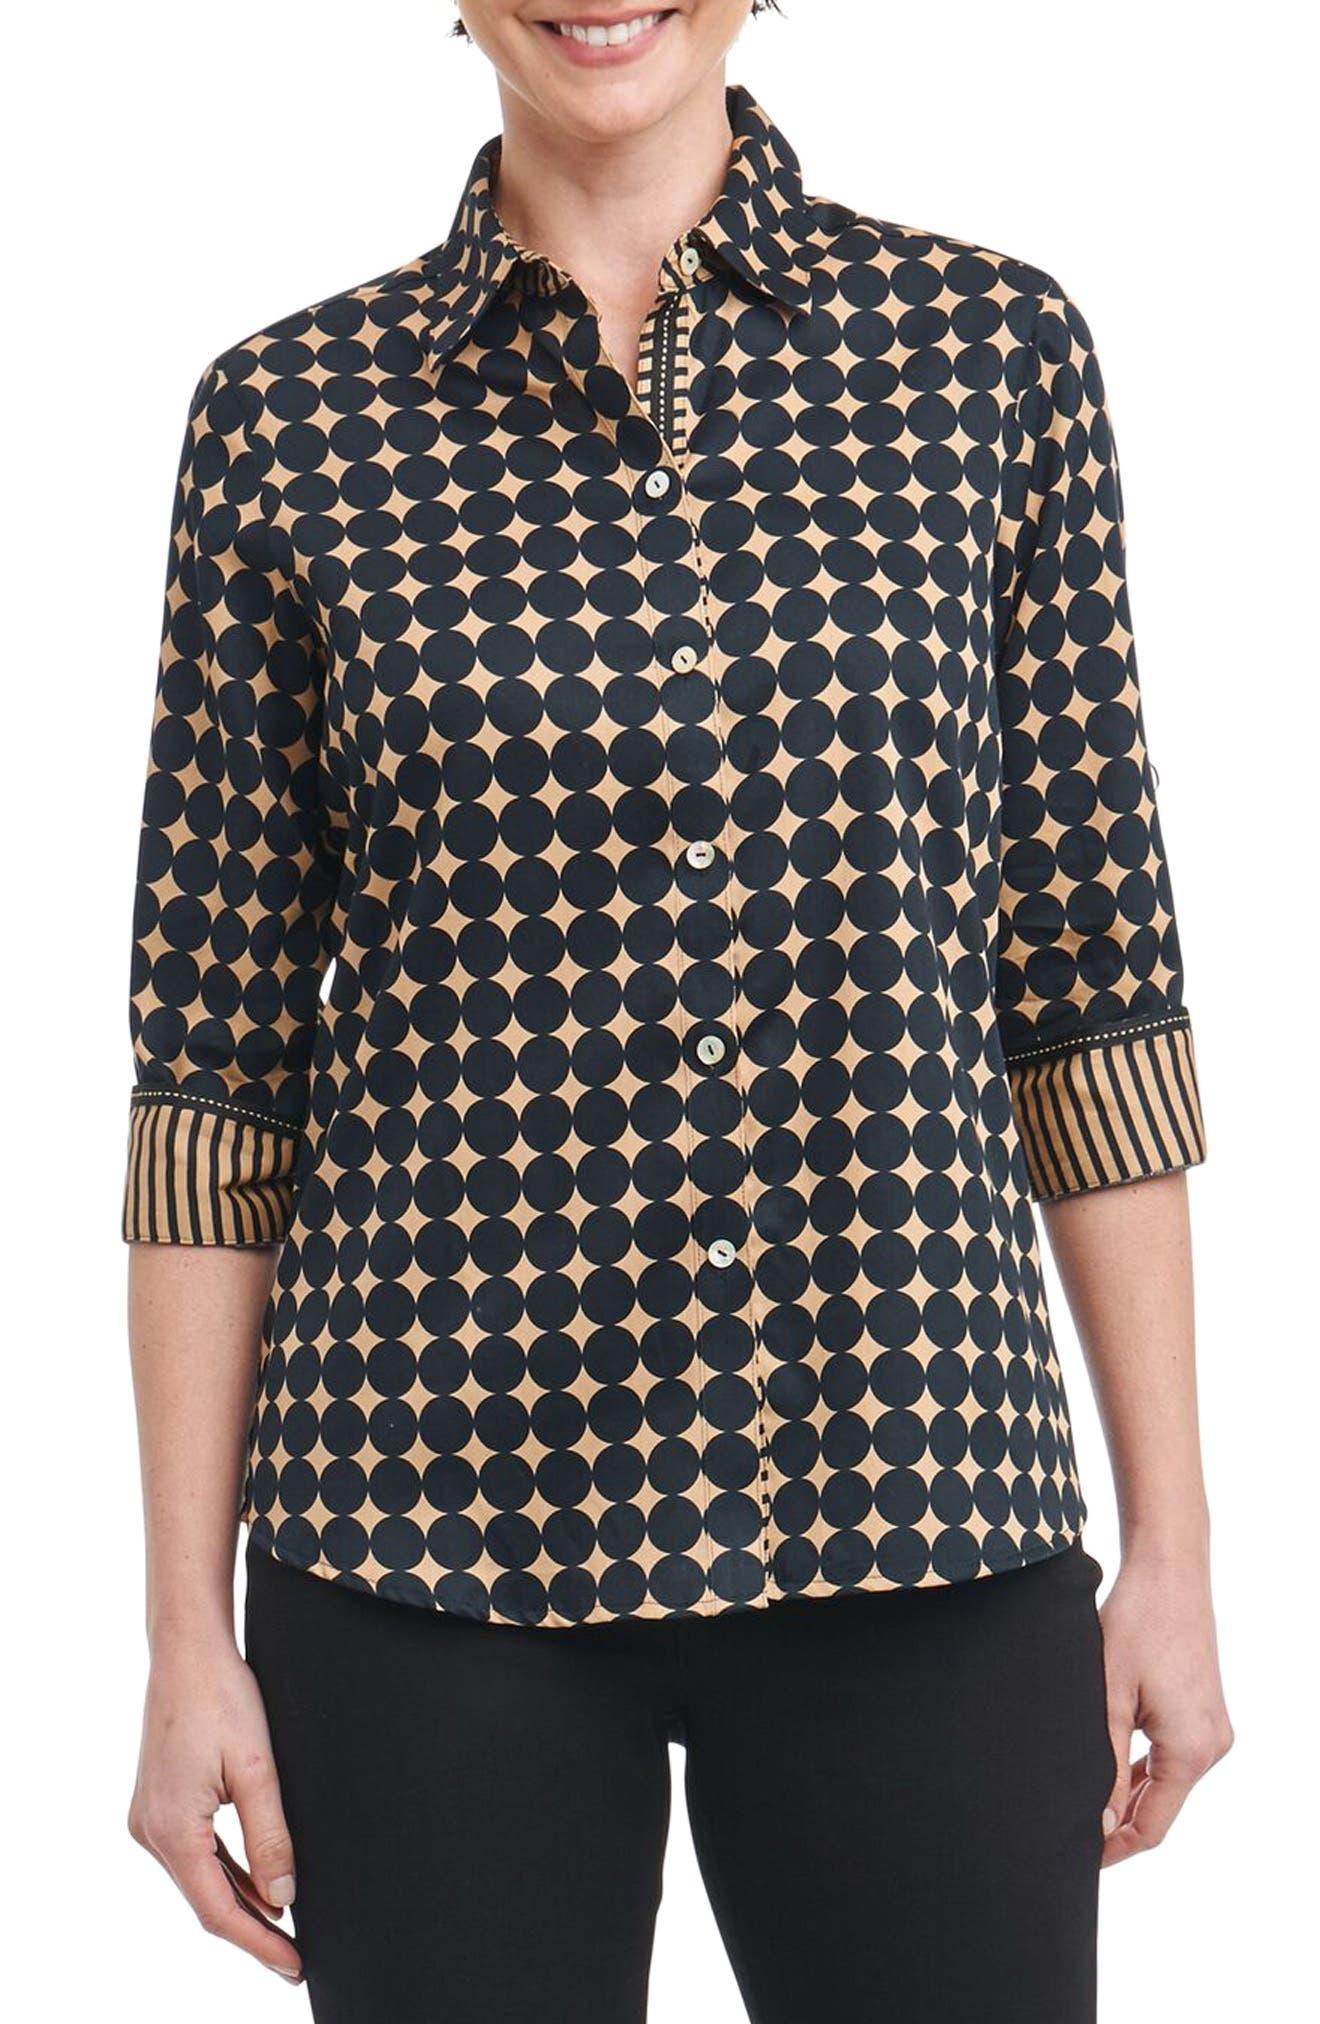 Main Image - Foxcroft Ava Non-Iron Dot Print Cotton Shirt (Regular & Petite)